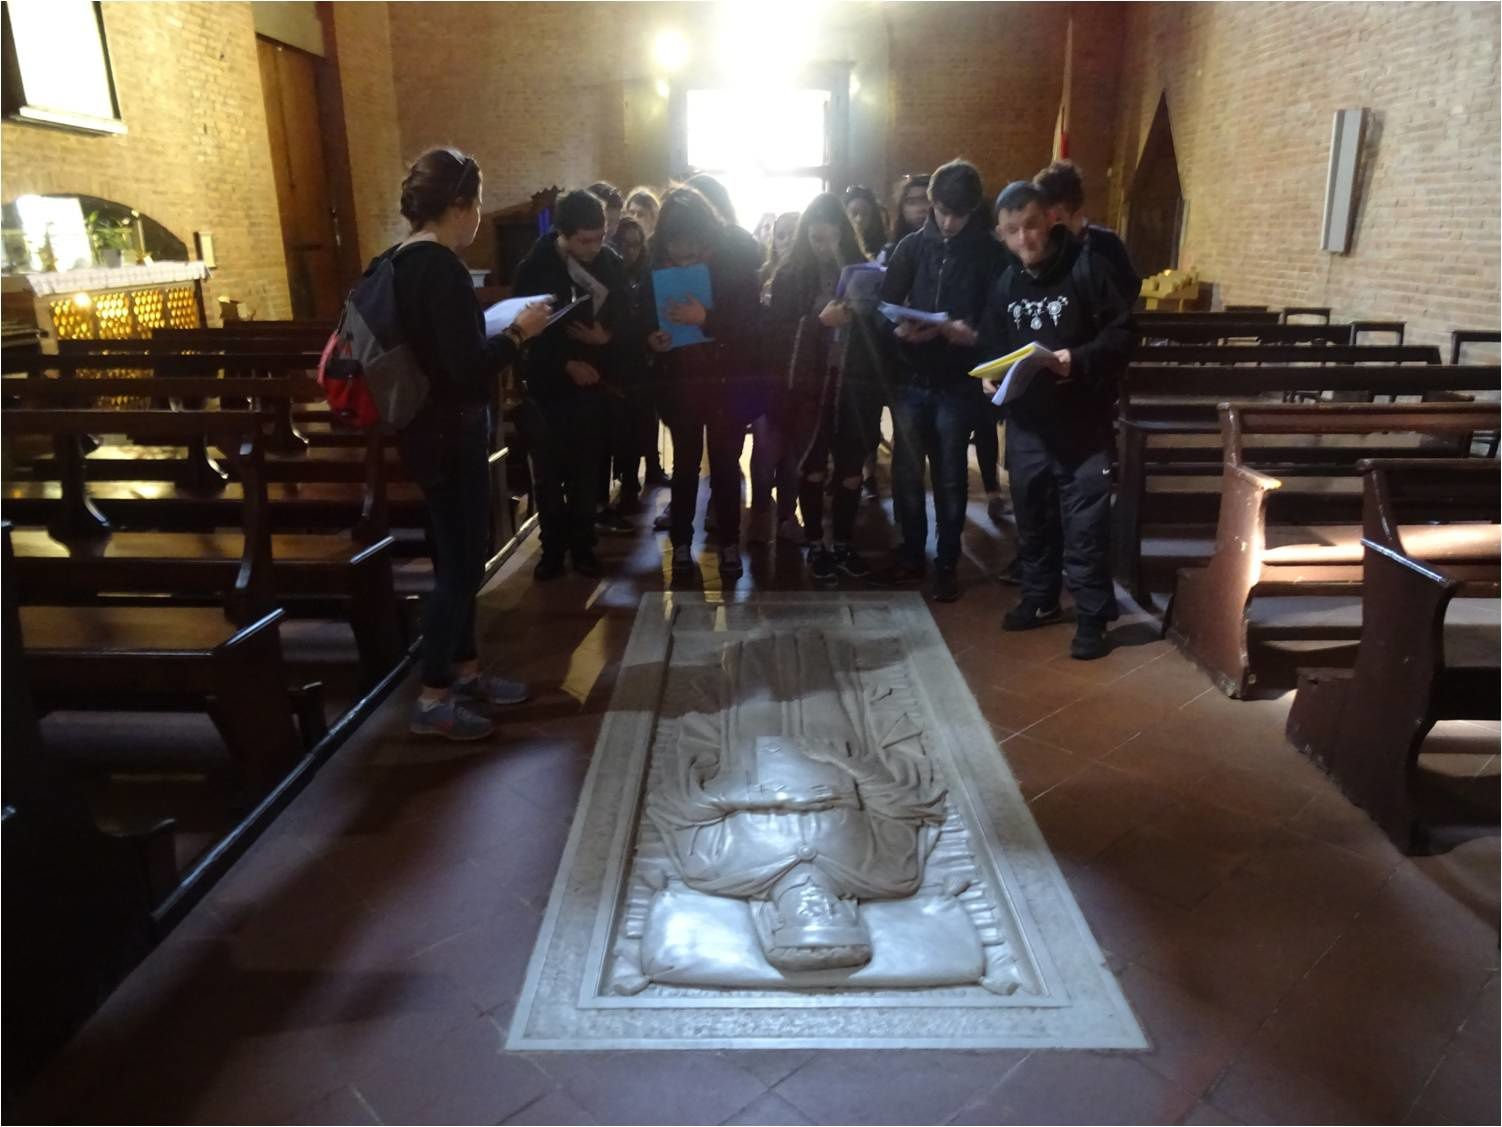 16-03-16, Eglise de Certaldo Alto, Sépulture de Boccace